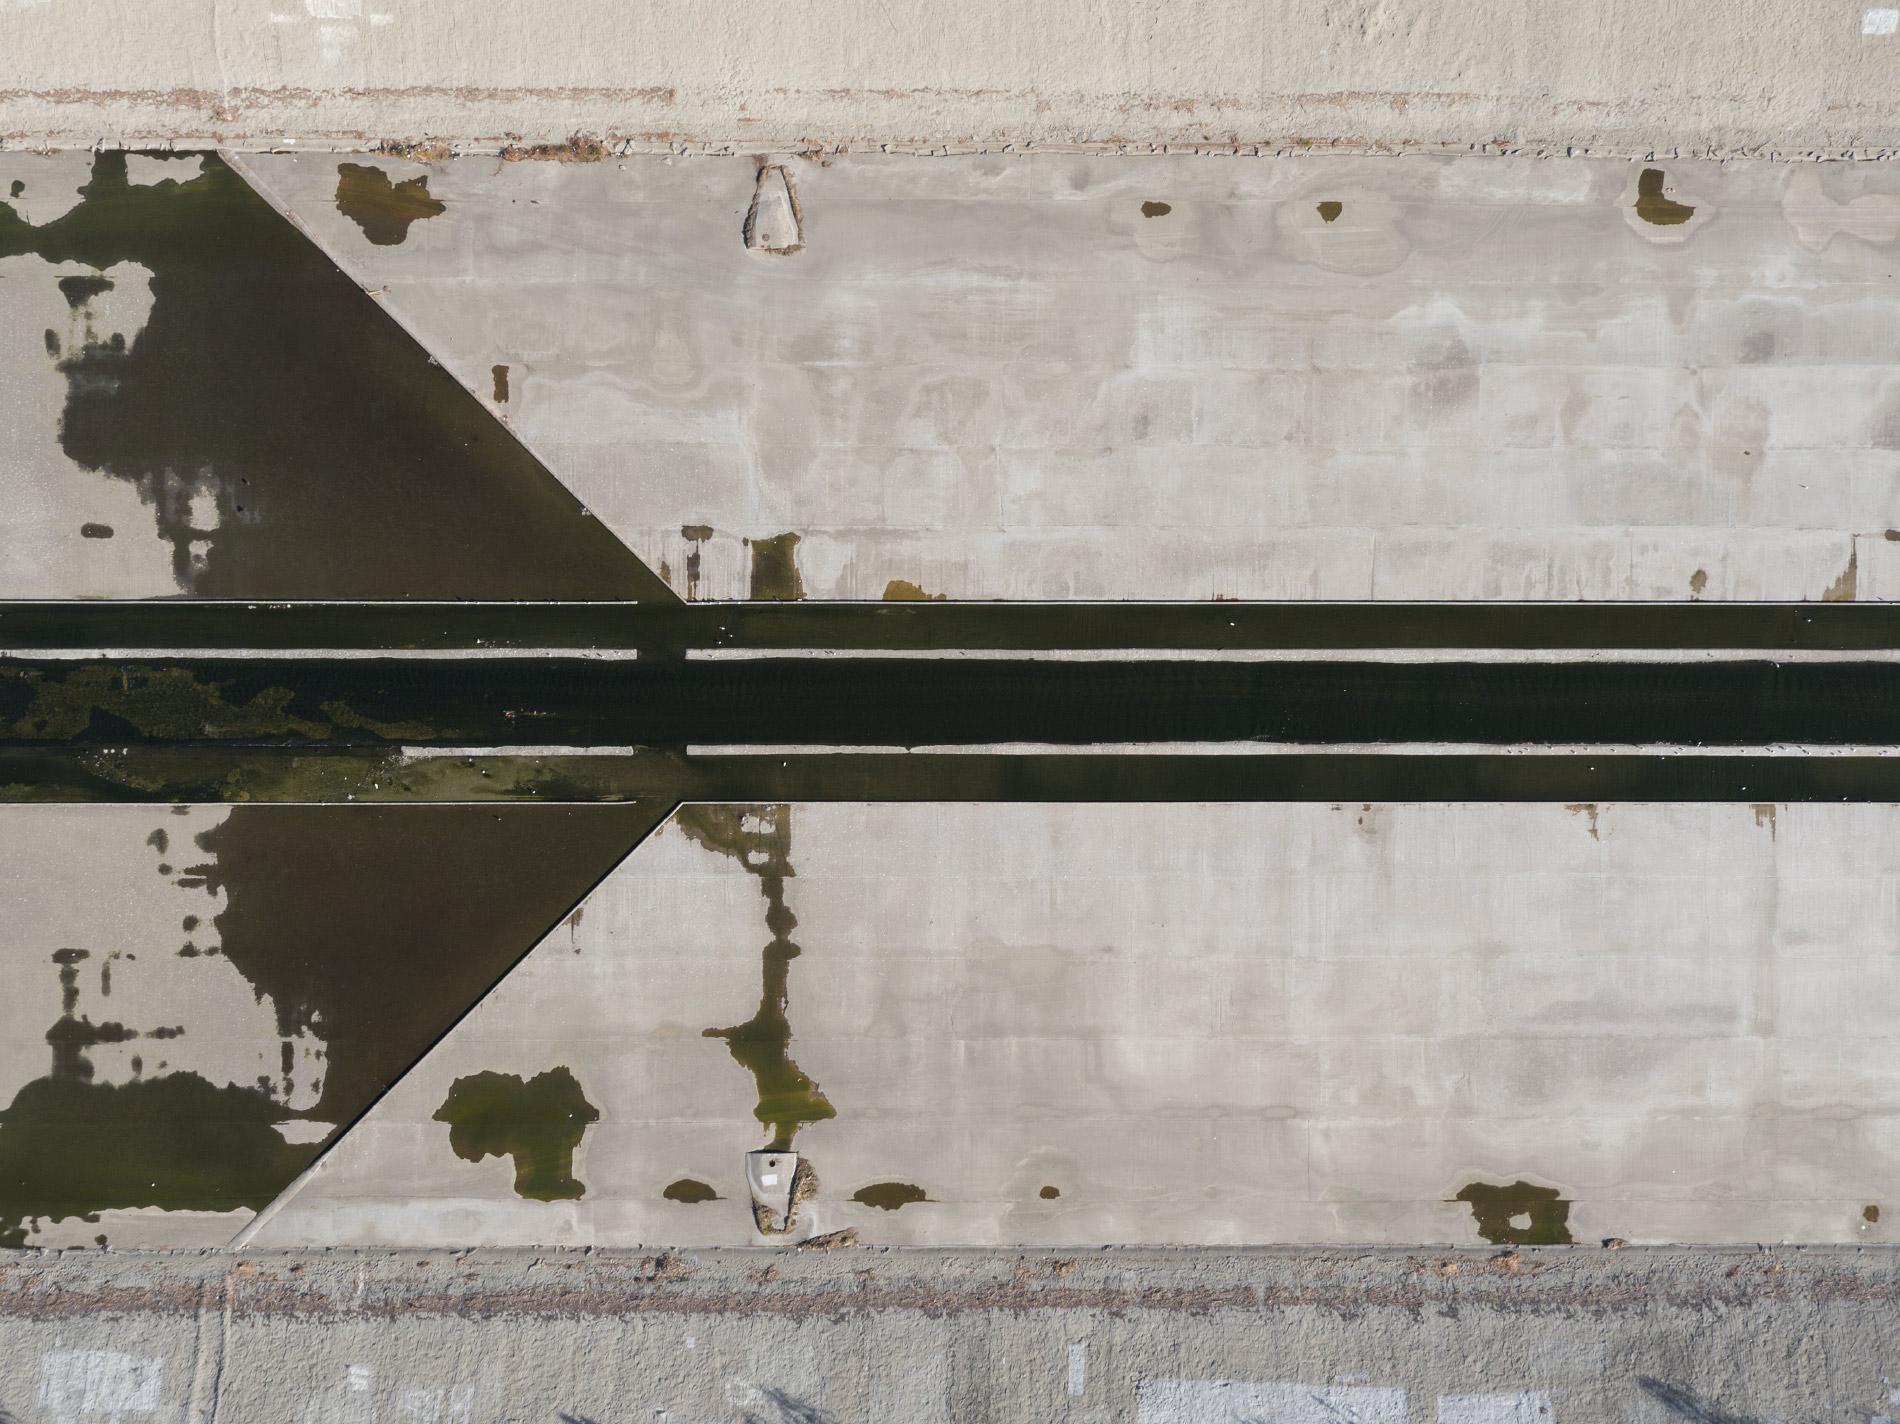 LA_River_drone_151218_03.jpg